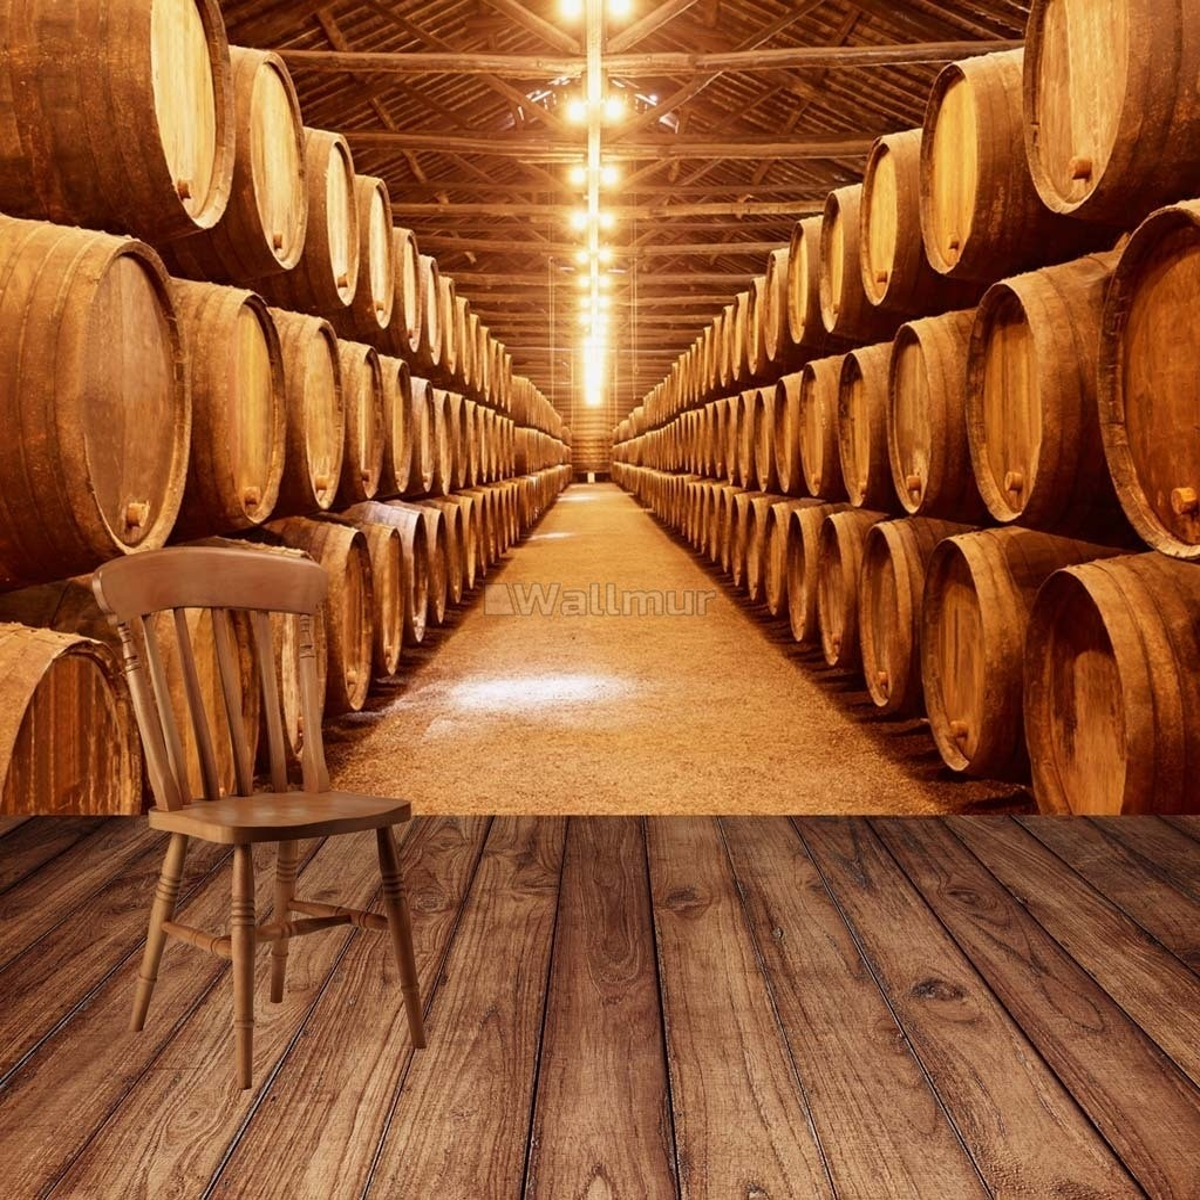 Beer Keg Wine Barrel Wallpaper Mural